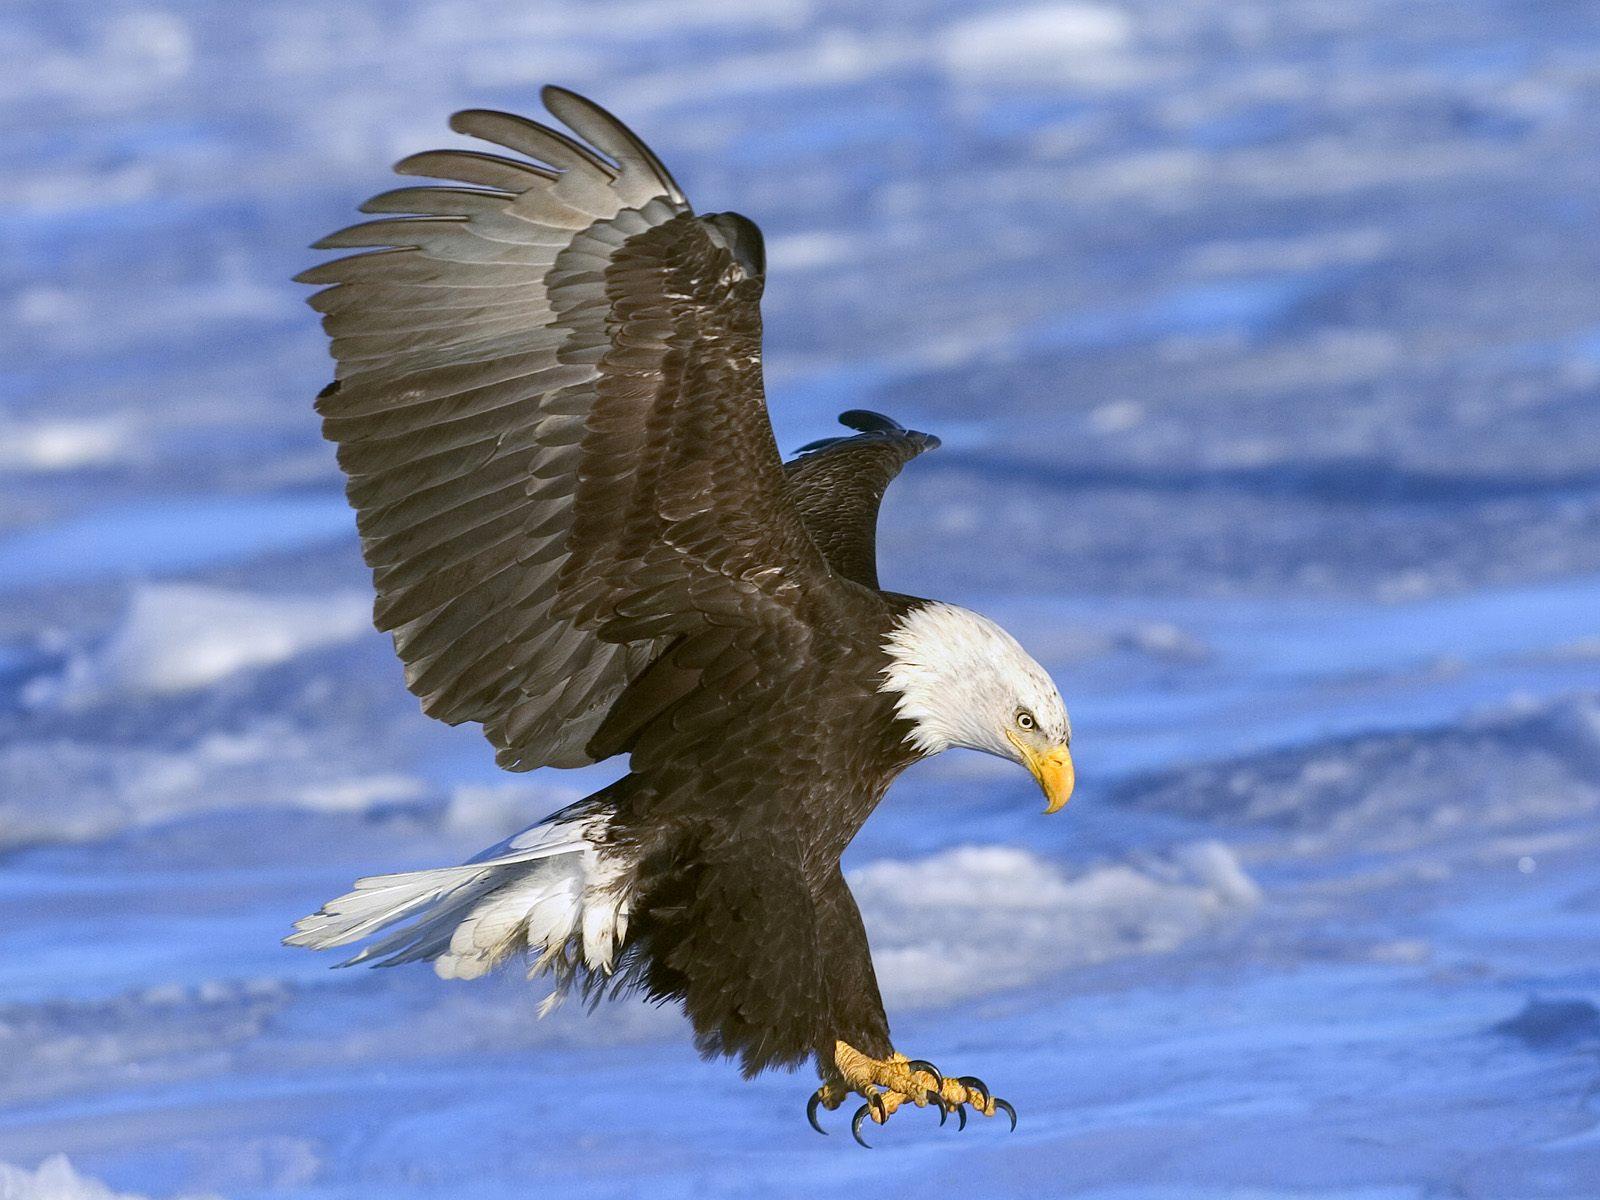 http://3.bp.blogspot.com/-92jEpuvoHl8/ToQlob_kpkI/AAAAAAAABYU/RHg7CFr3KG8/s1600/Bald+Eagle+in+Flight%252C+Alaska.jpg